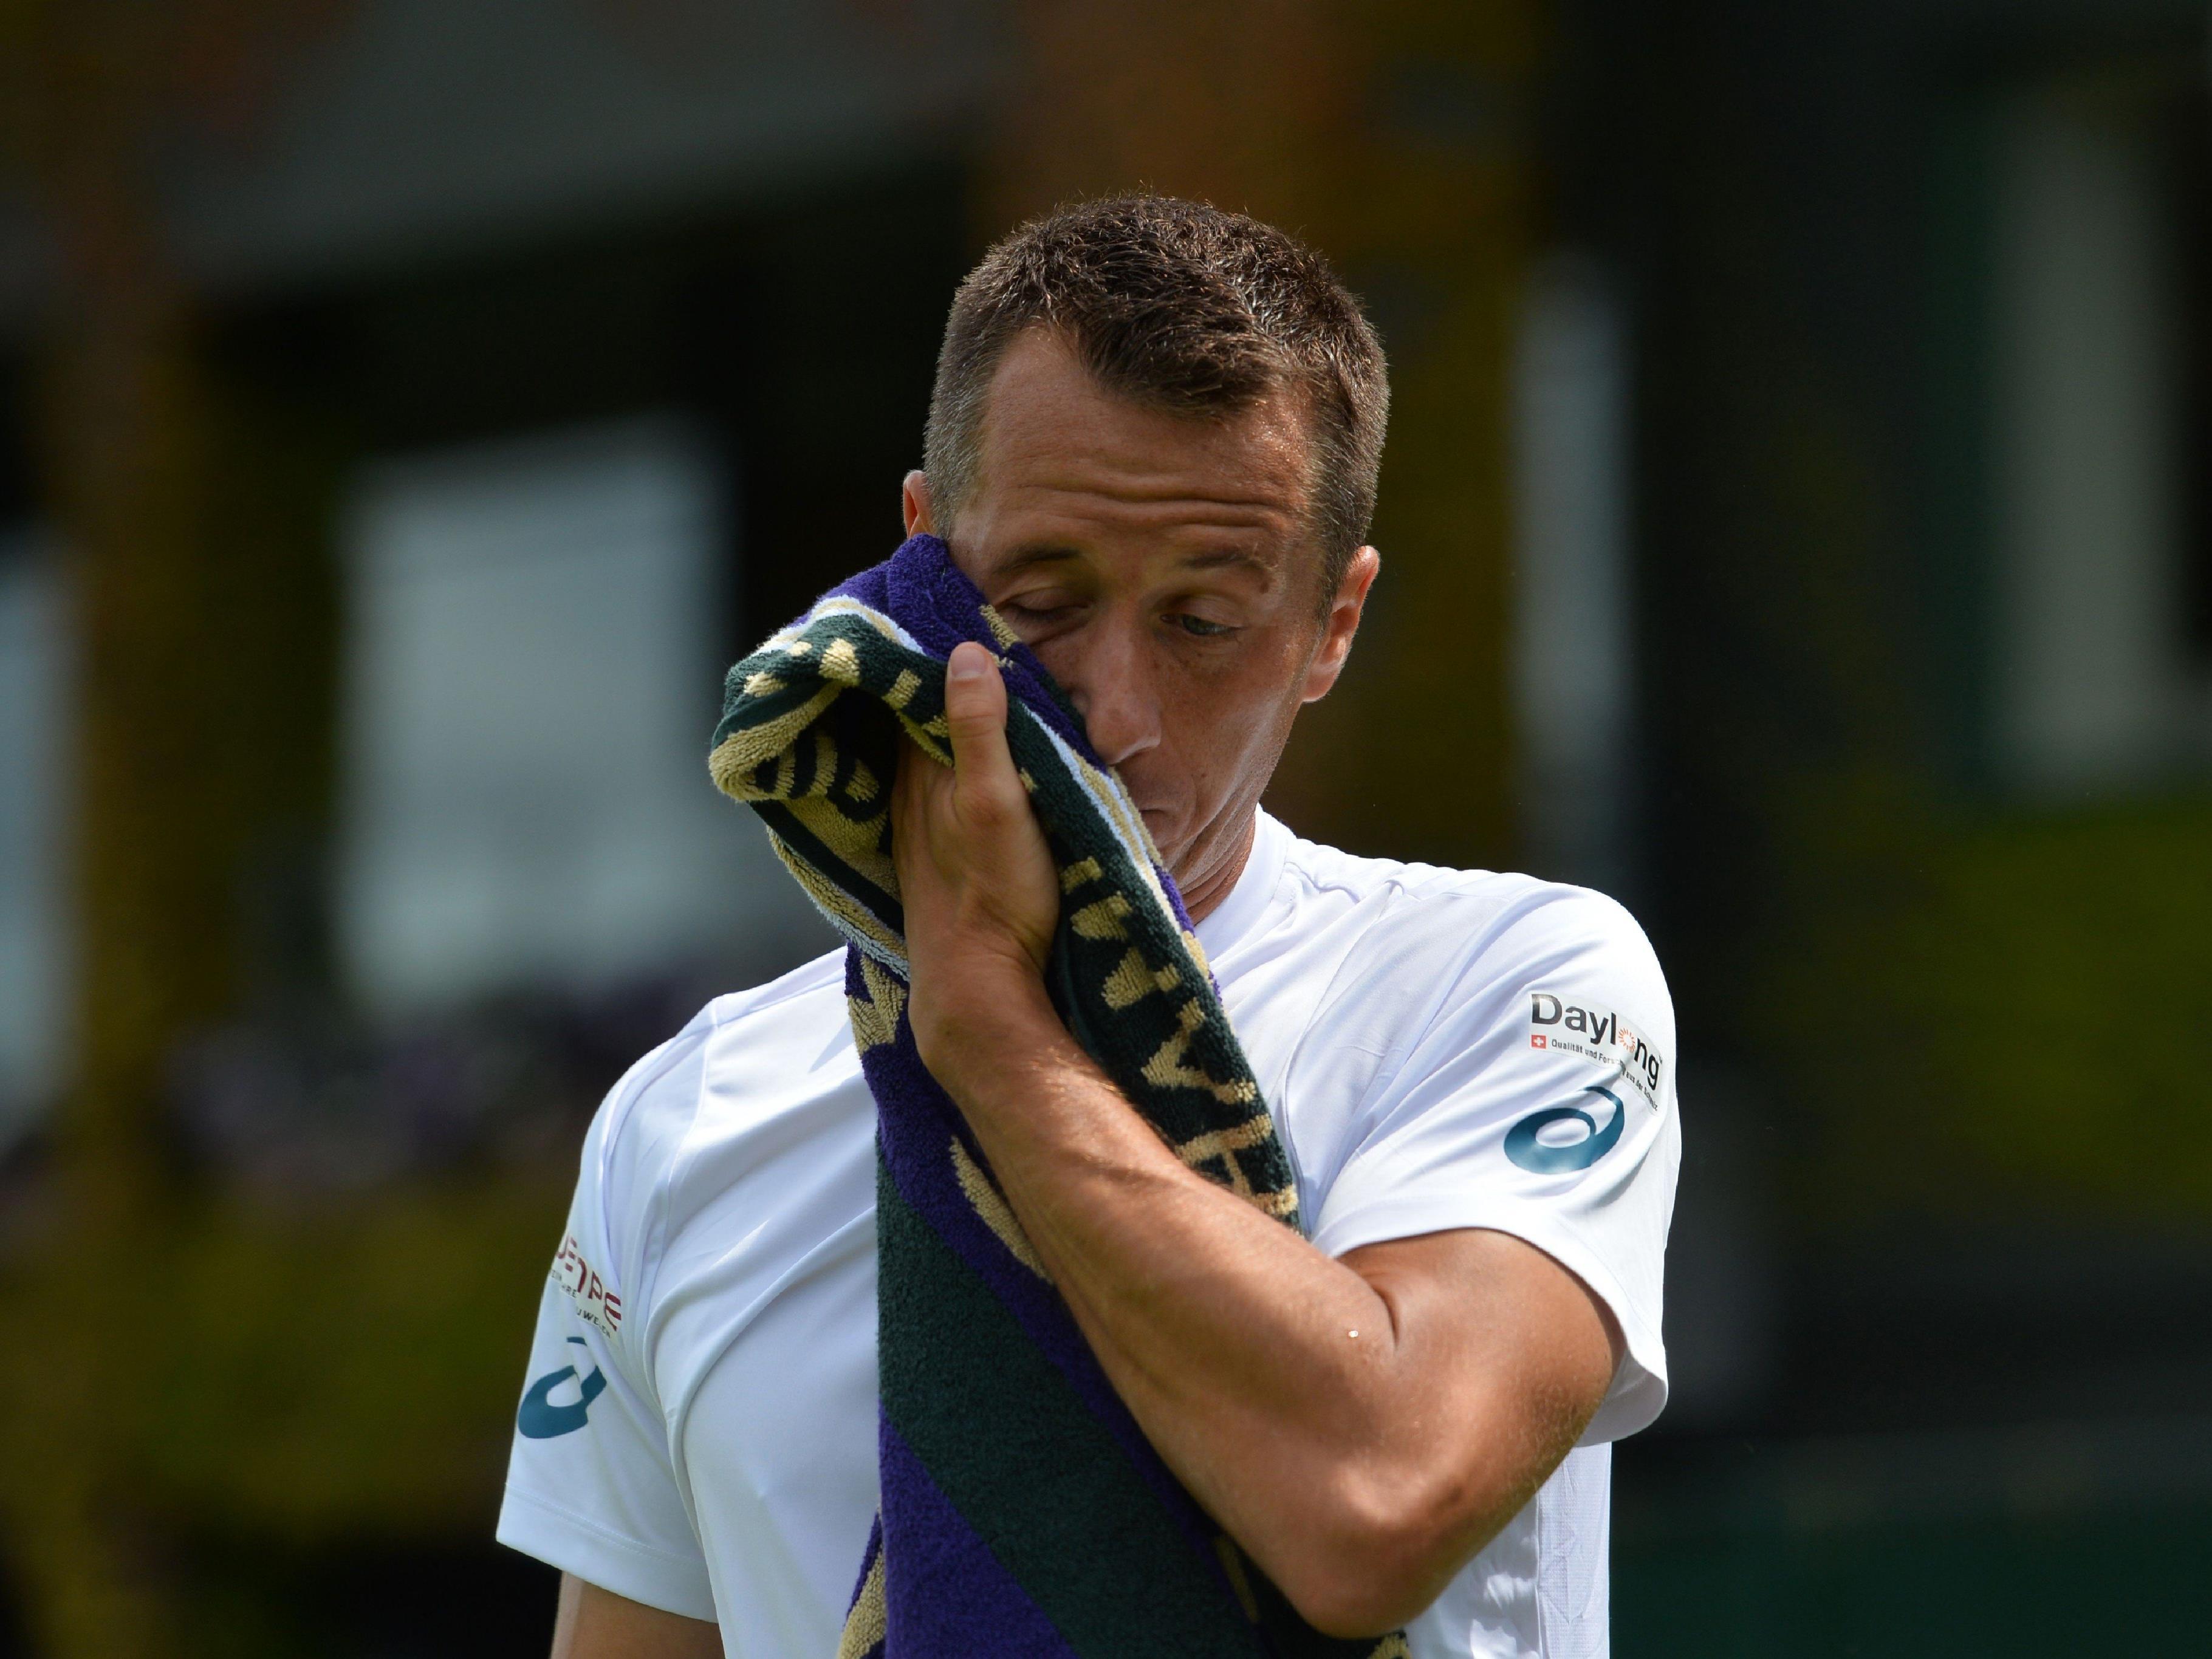 Der an Nummer 21 gesetzte Philipp Kohlschreiber verlor sein Erstrunden-Match in Wibledon gegen den Franzosen Pierre-Hugues Herbert.